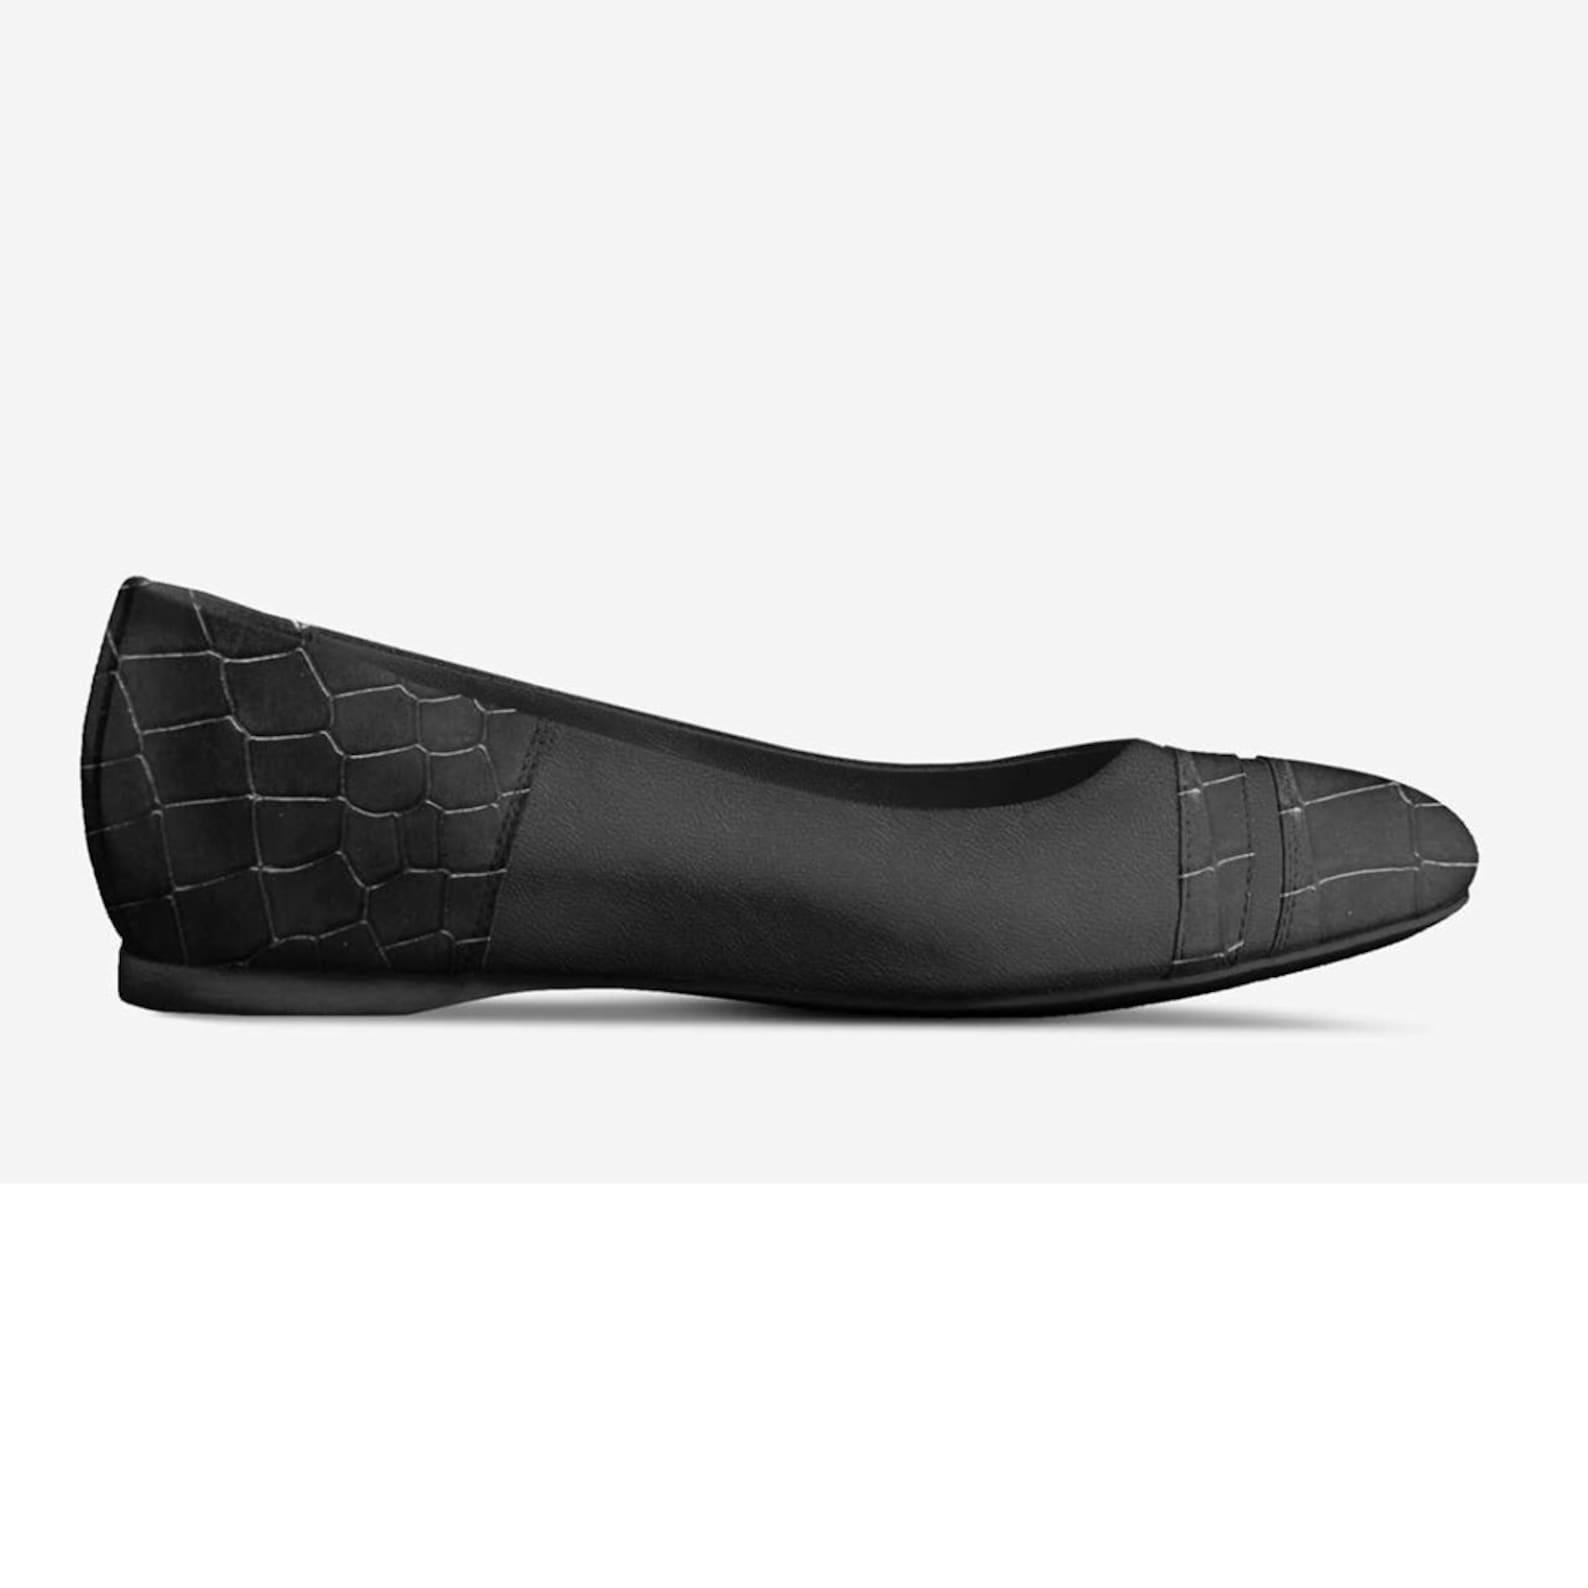 basic ballet flats shoe (black combo)